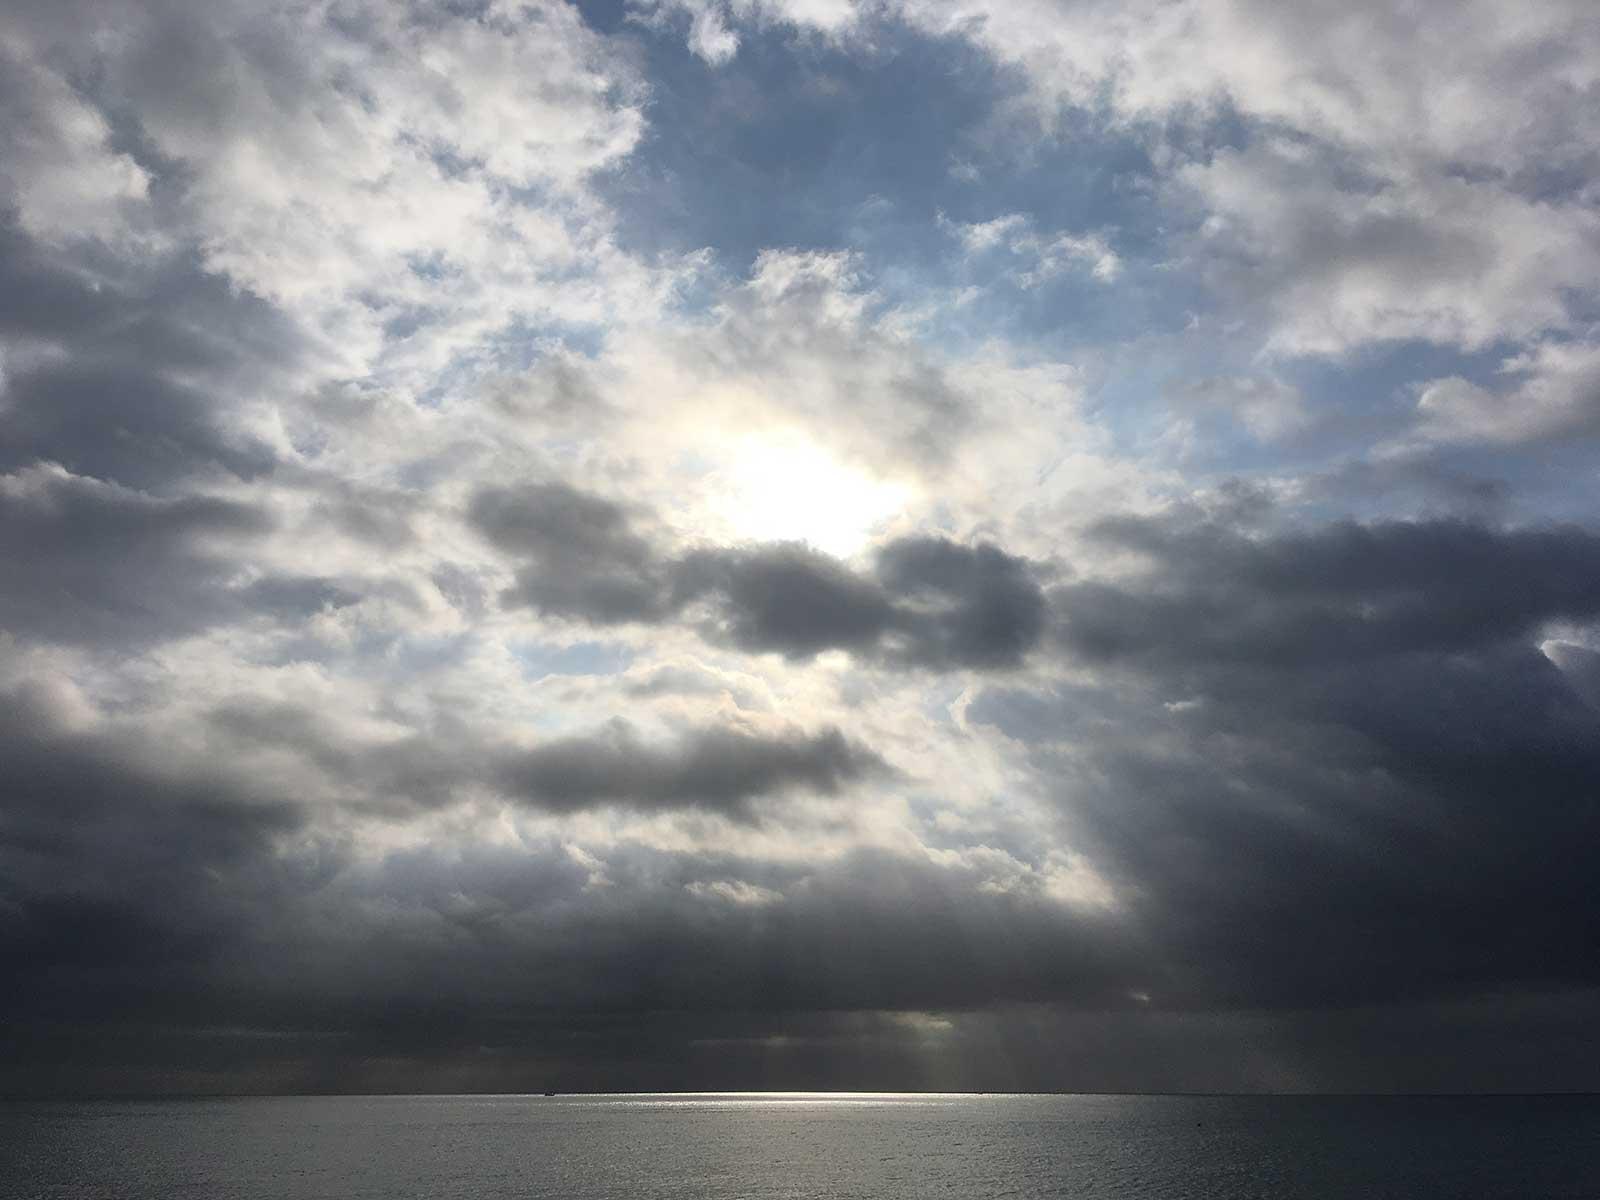 Mar gris en Barcelona. 6 octubre 2019